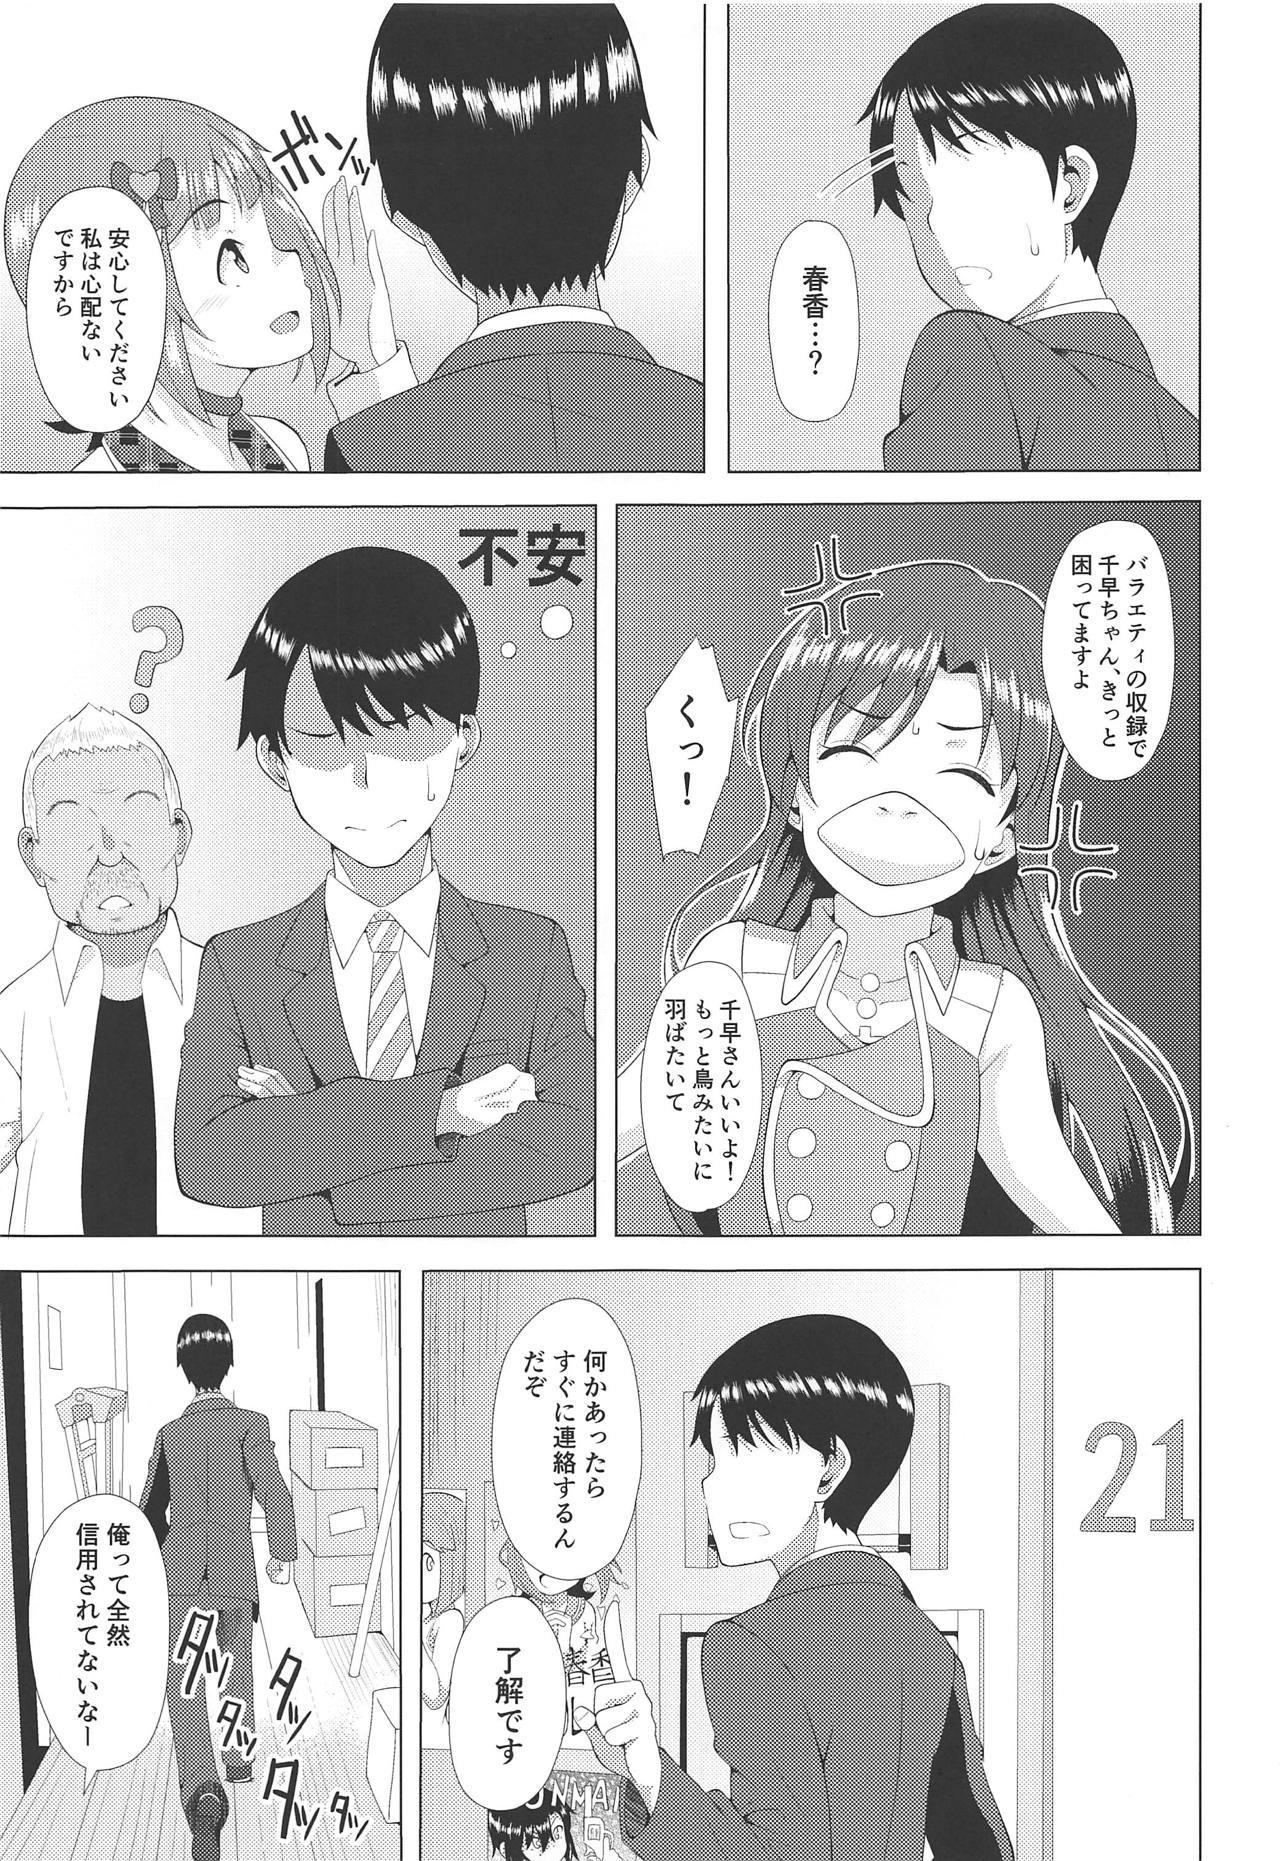 Ninki Idol no Renai Jijou 3